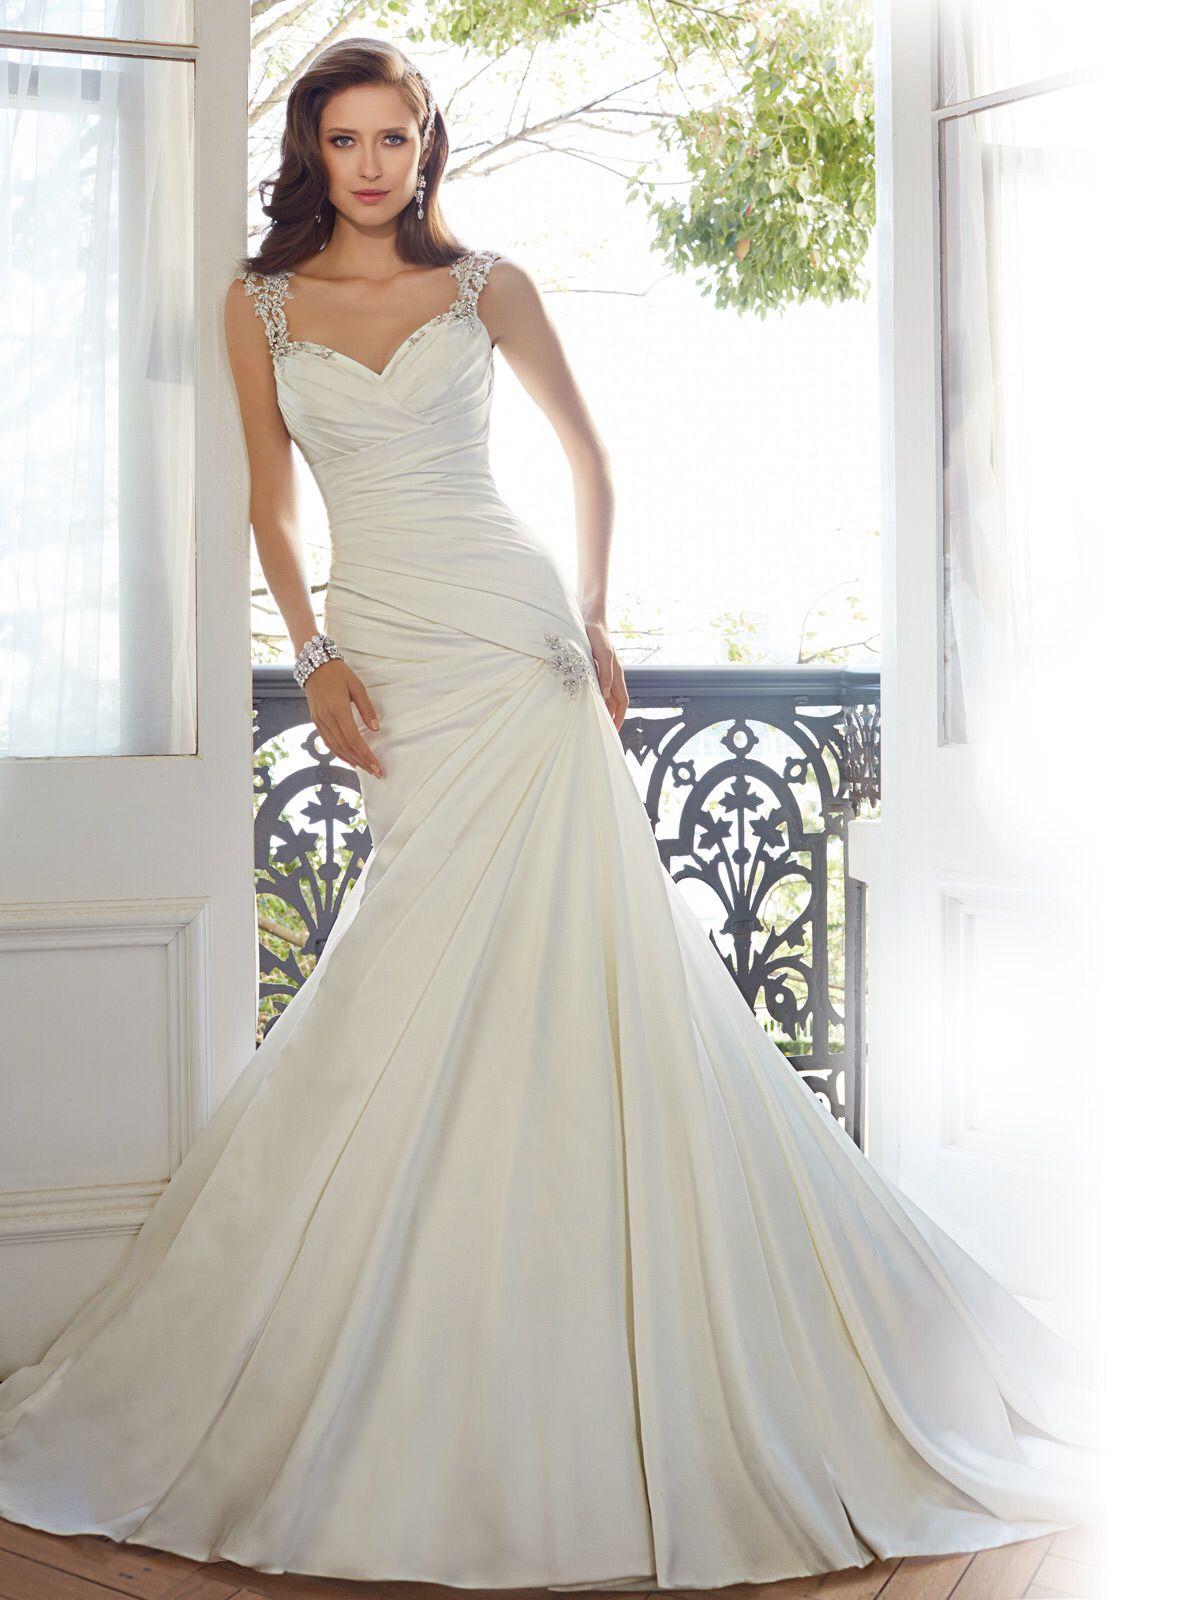 Lace strap wedding dress  No lace no tulle  Wedding stuff  Pinterest  Wedding stuff and